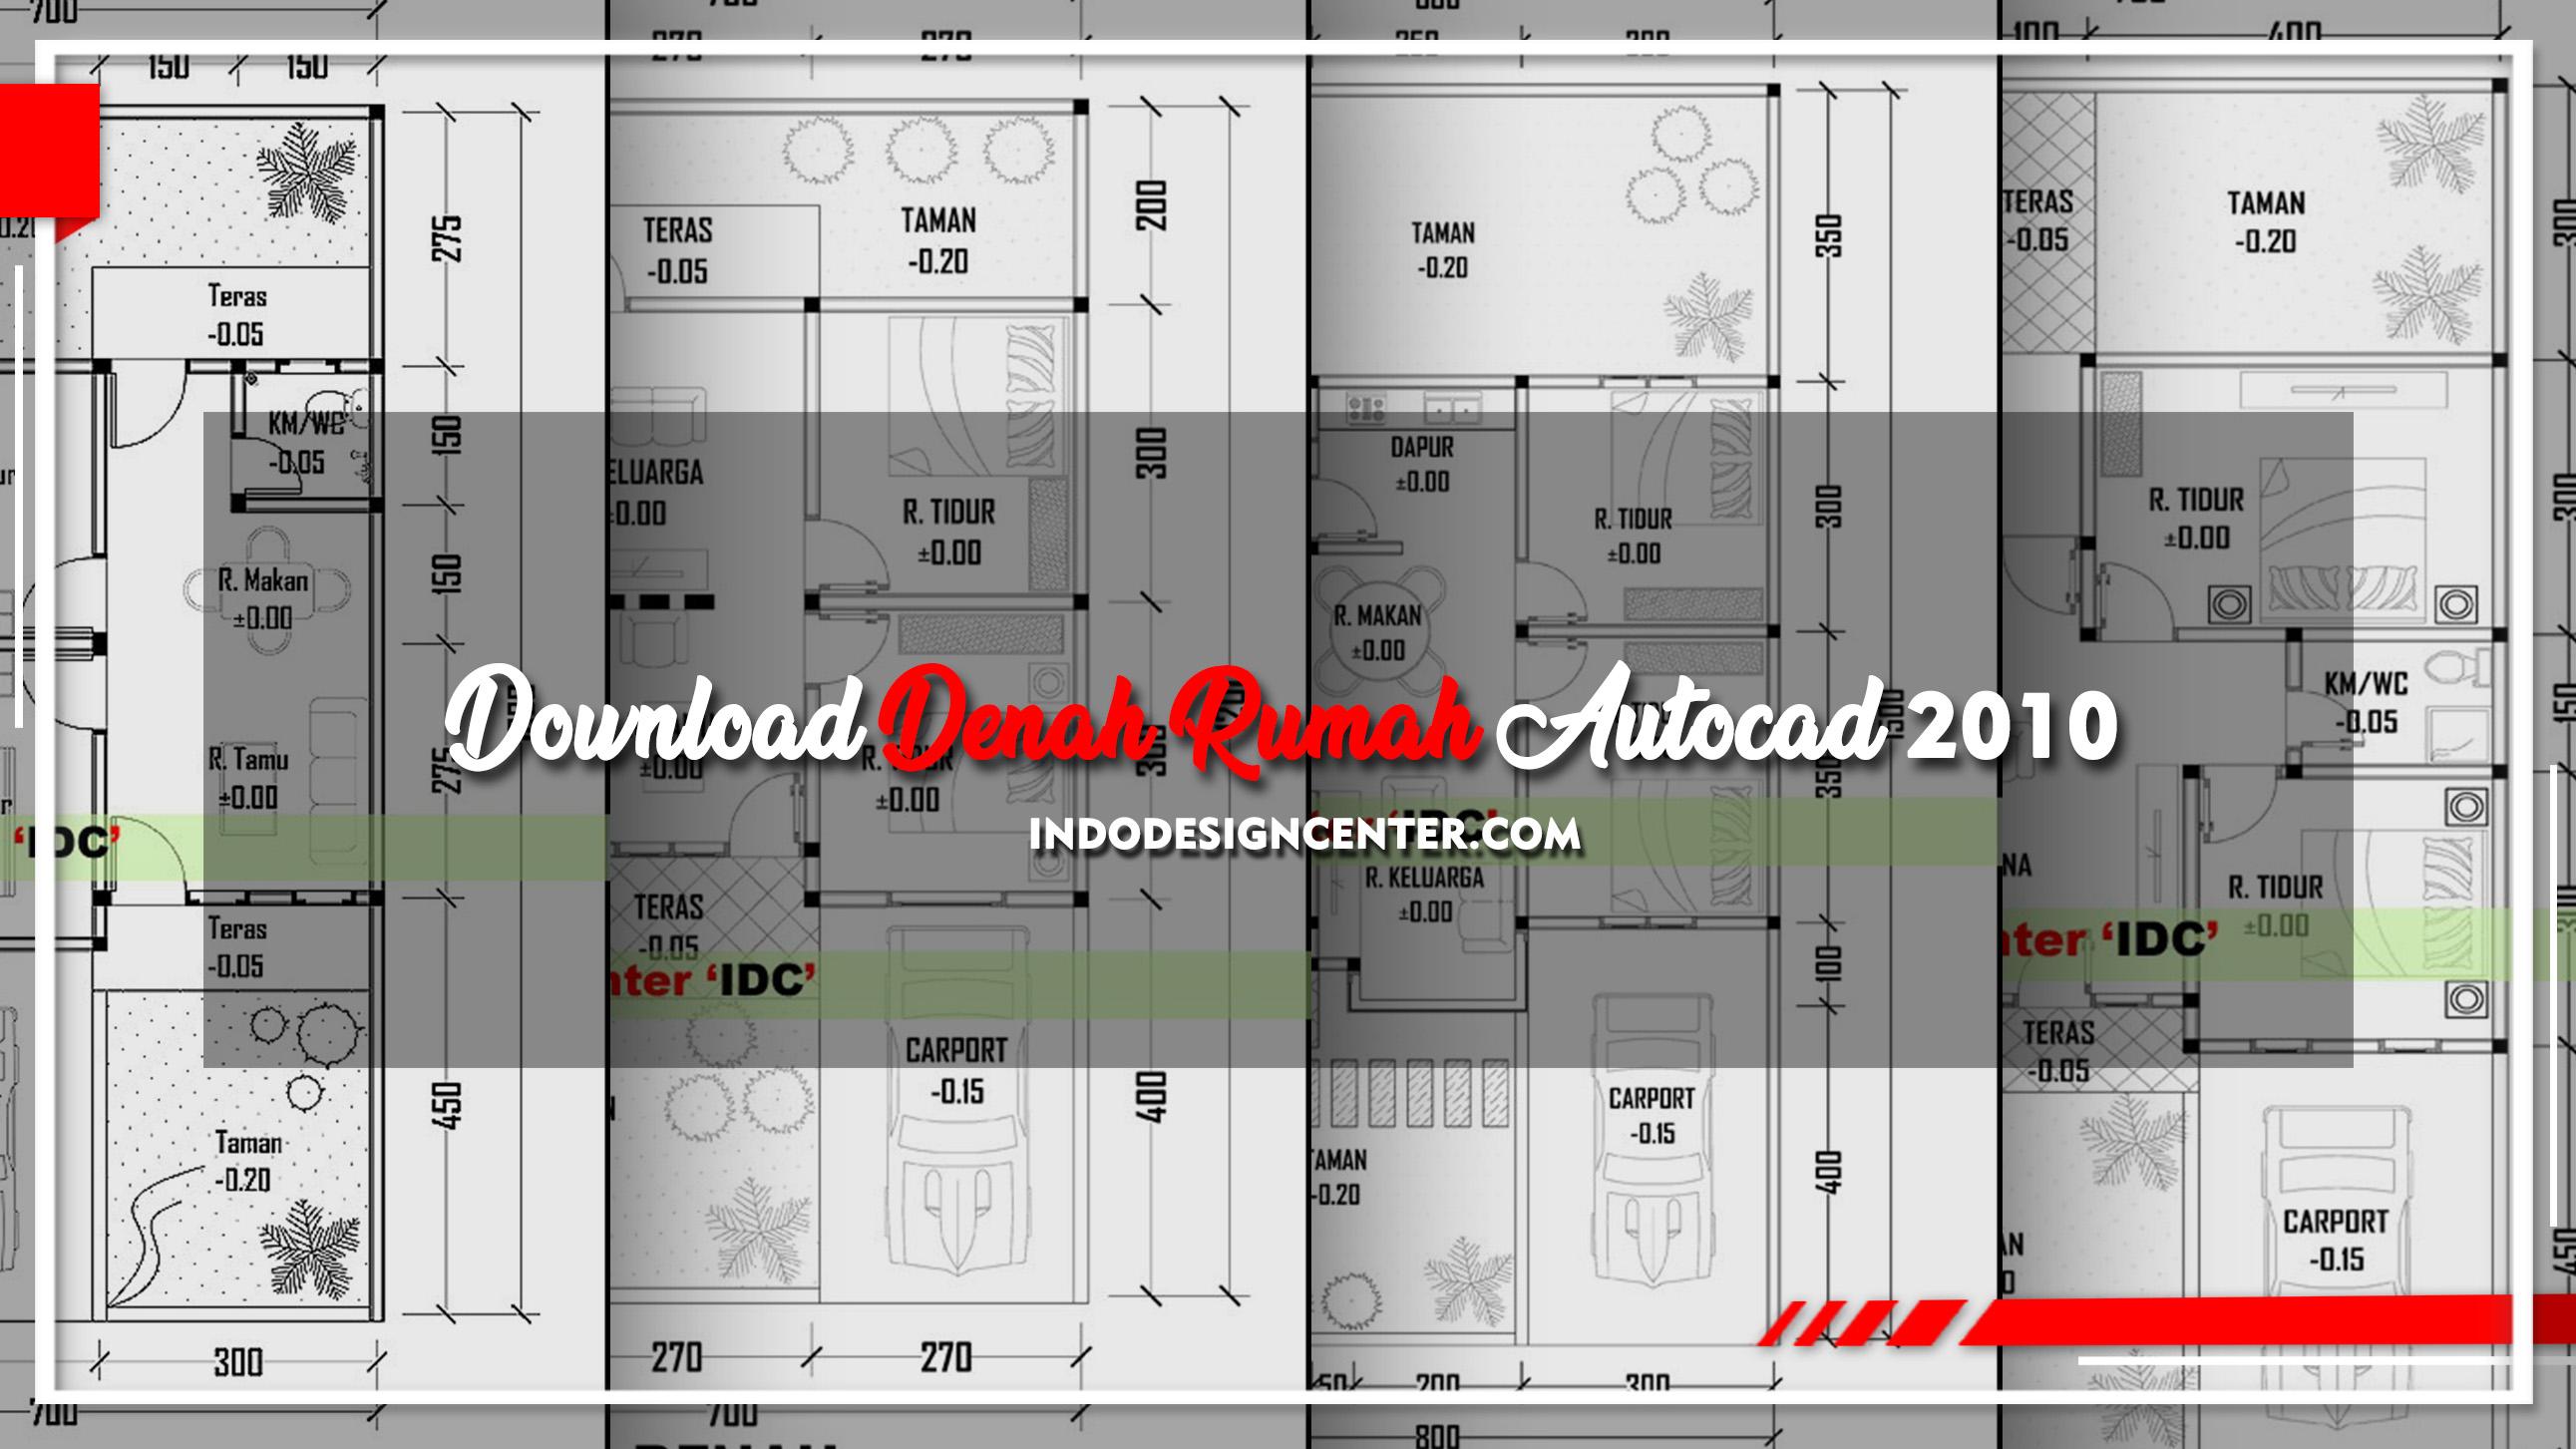 Download Denah Rumah Autocad 2010